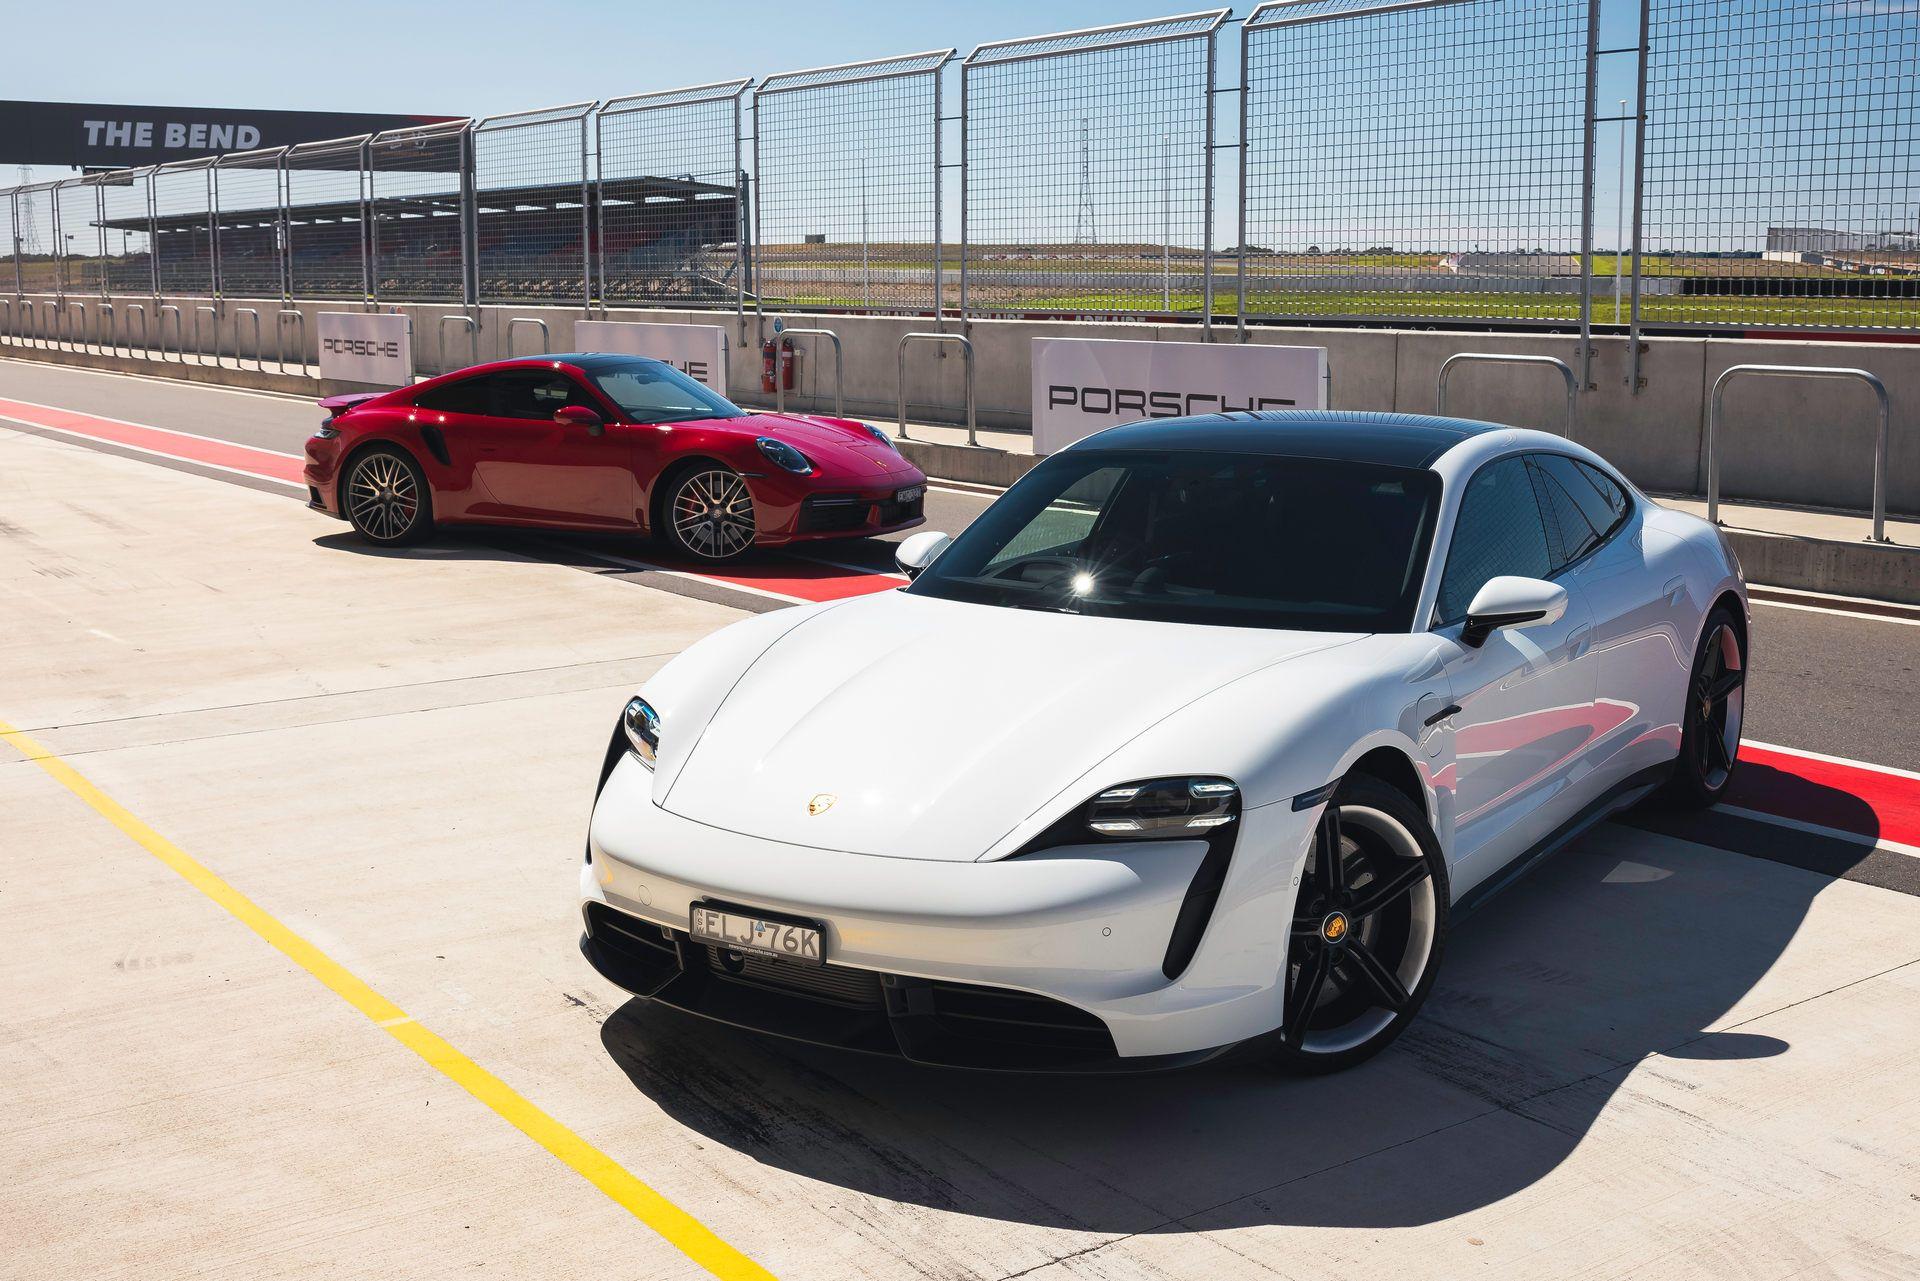 Porsche-Taycan-Turbo-S-The-Bend-Motorsport-Park-19